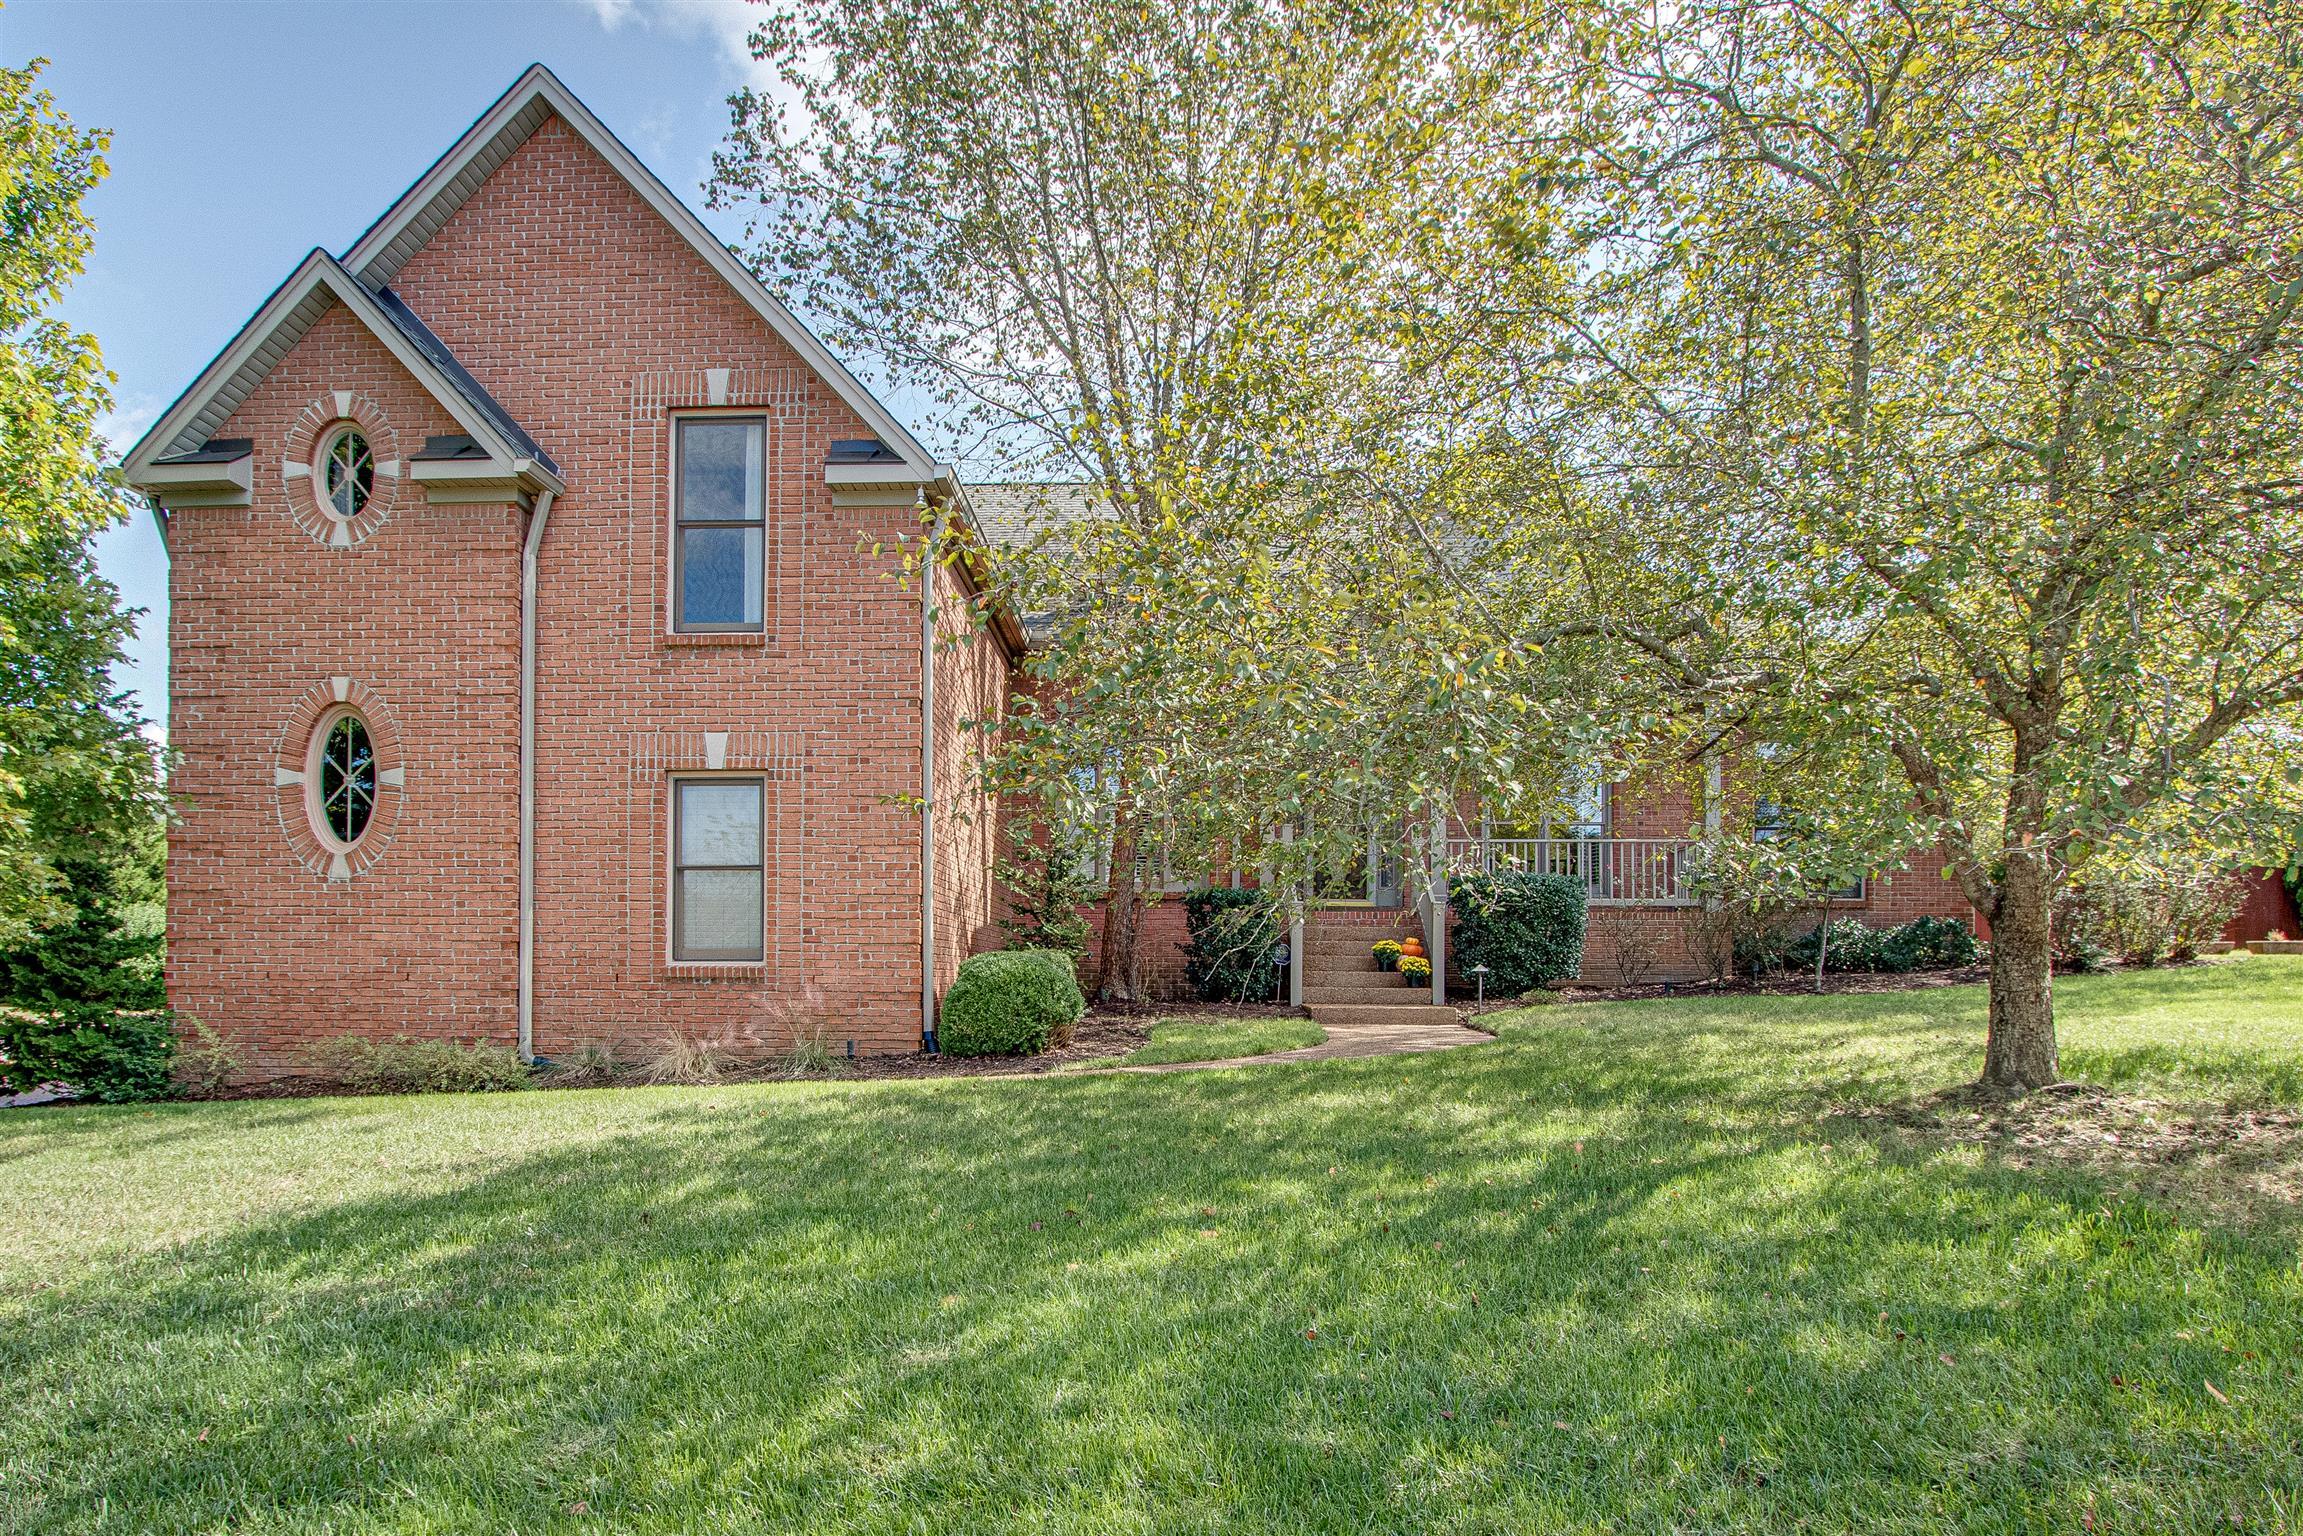 1301 Fishers Meadows Cv, Hermitage, TN 37076 - Hermitage, TN real estate listing